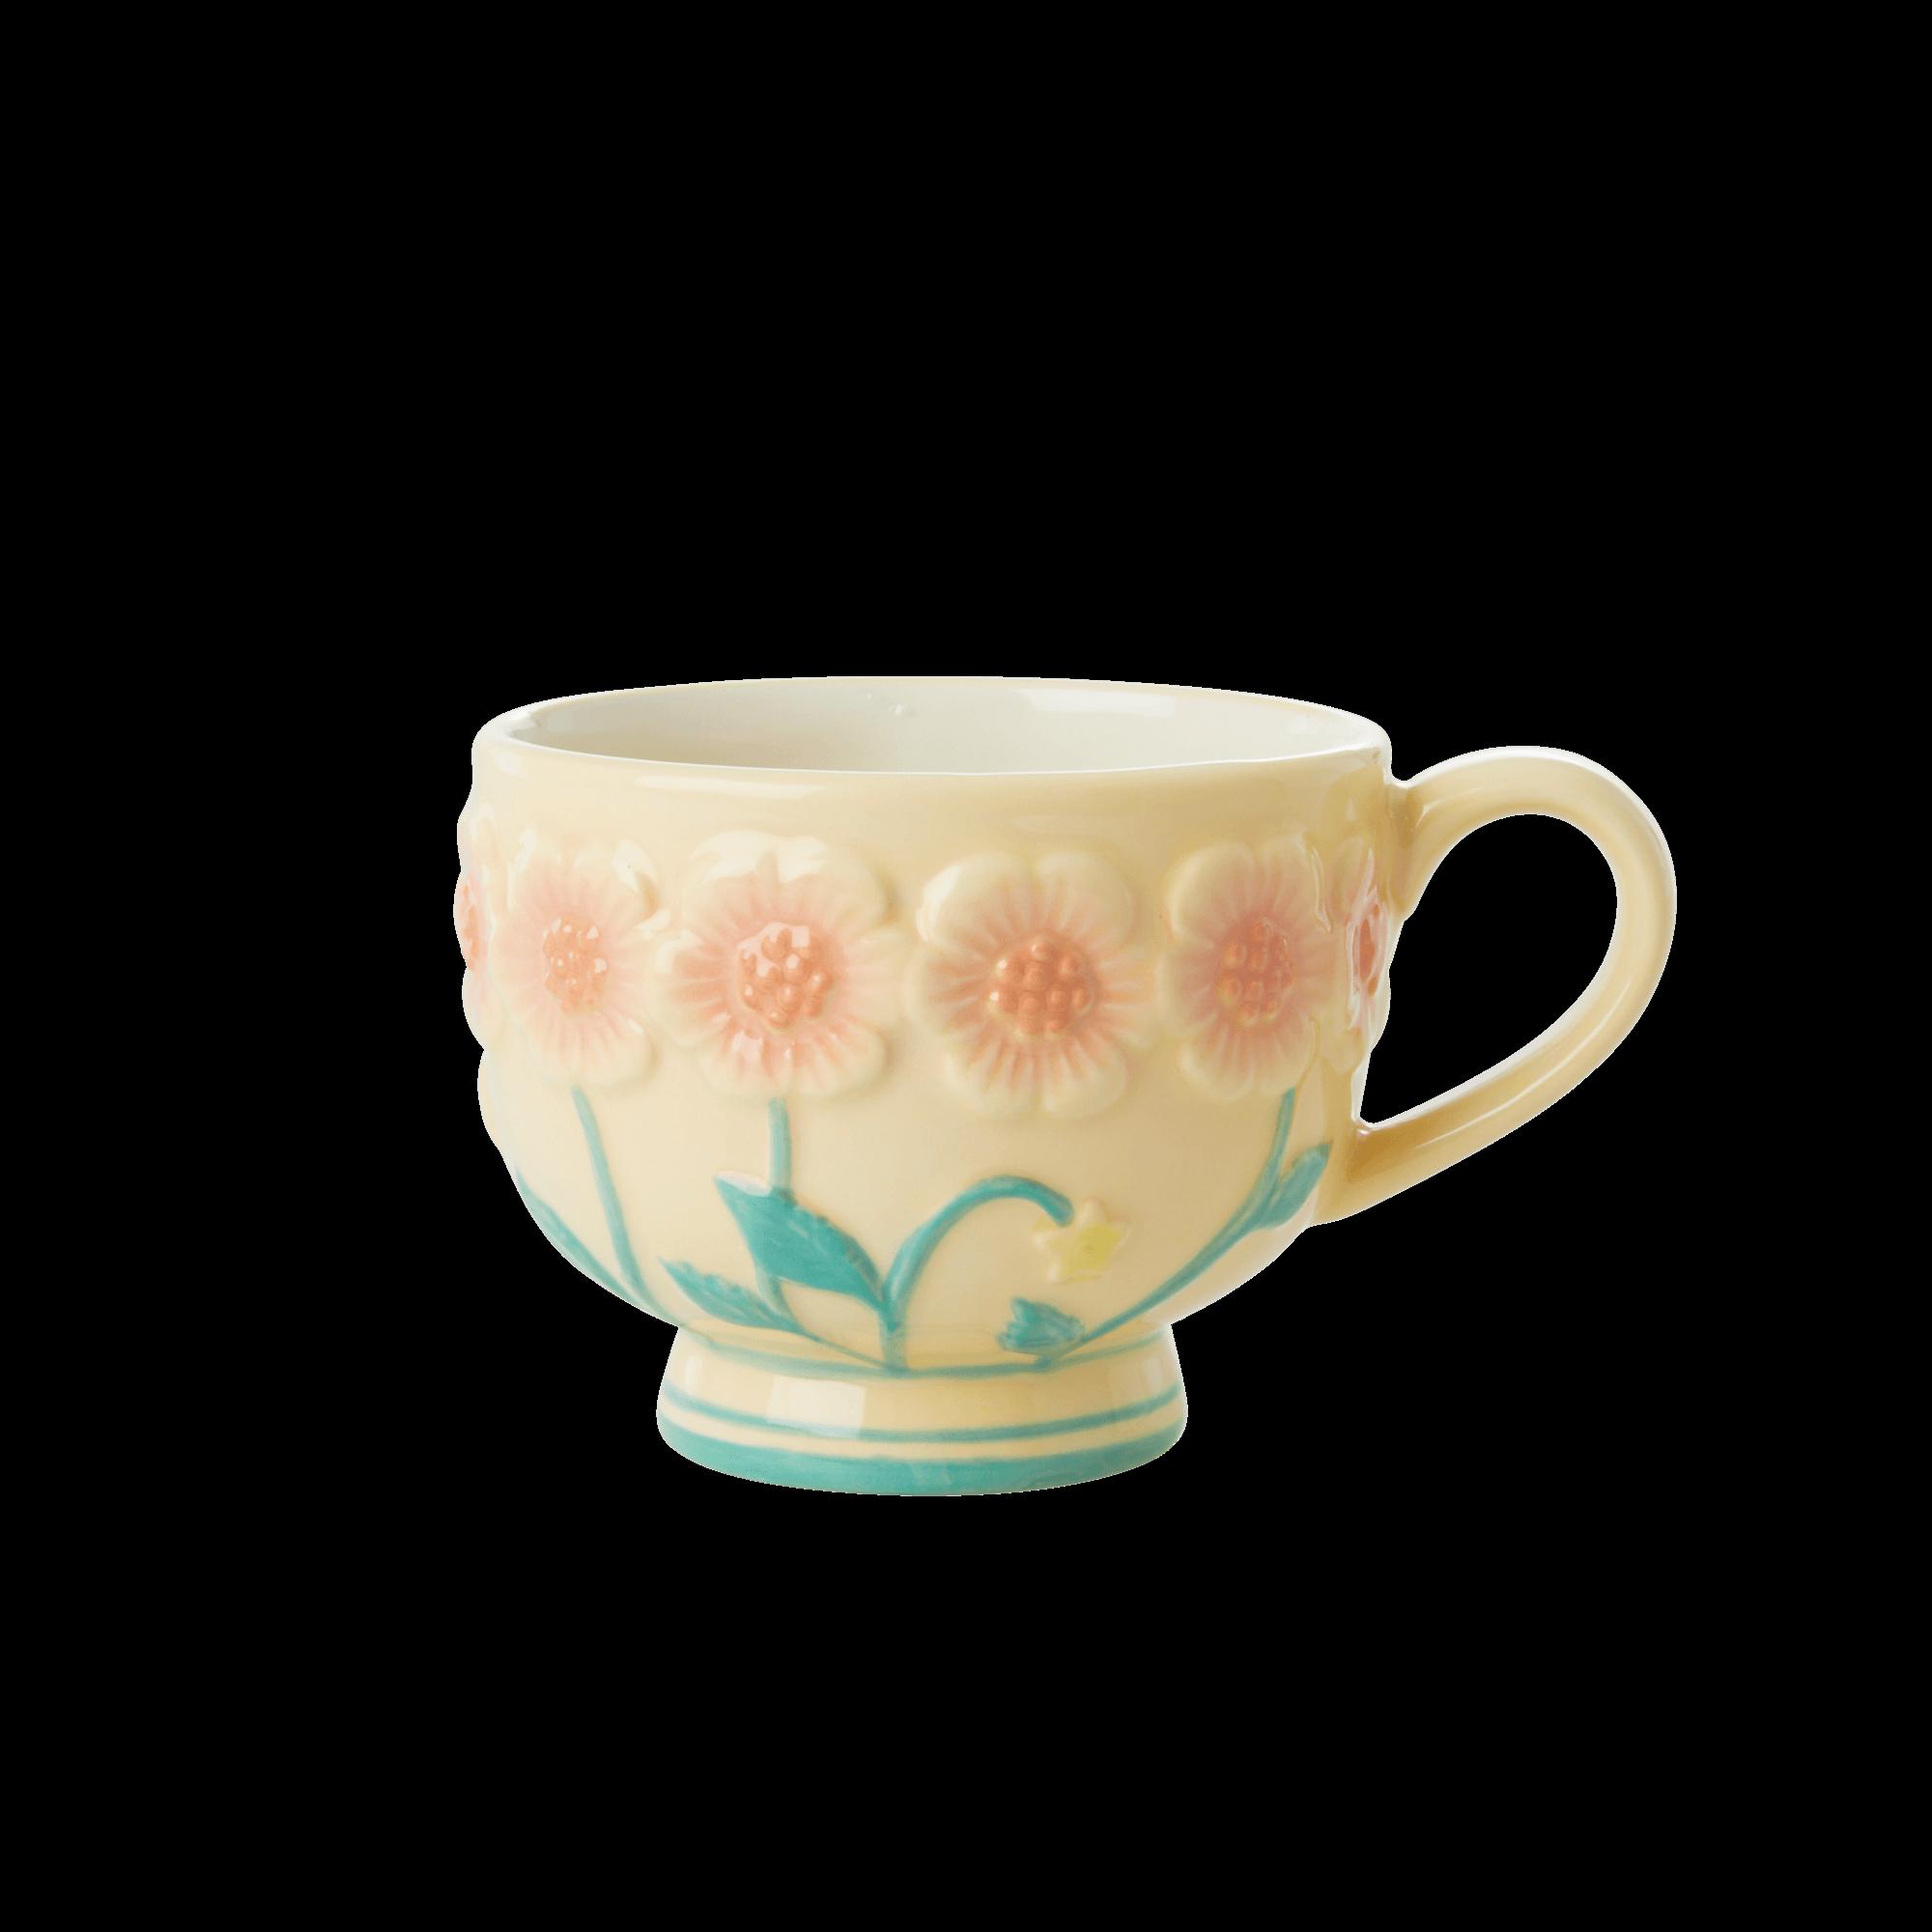 Rice - Ceramic Mug -Embossed Creme Flower Design